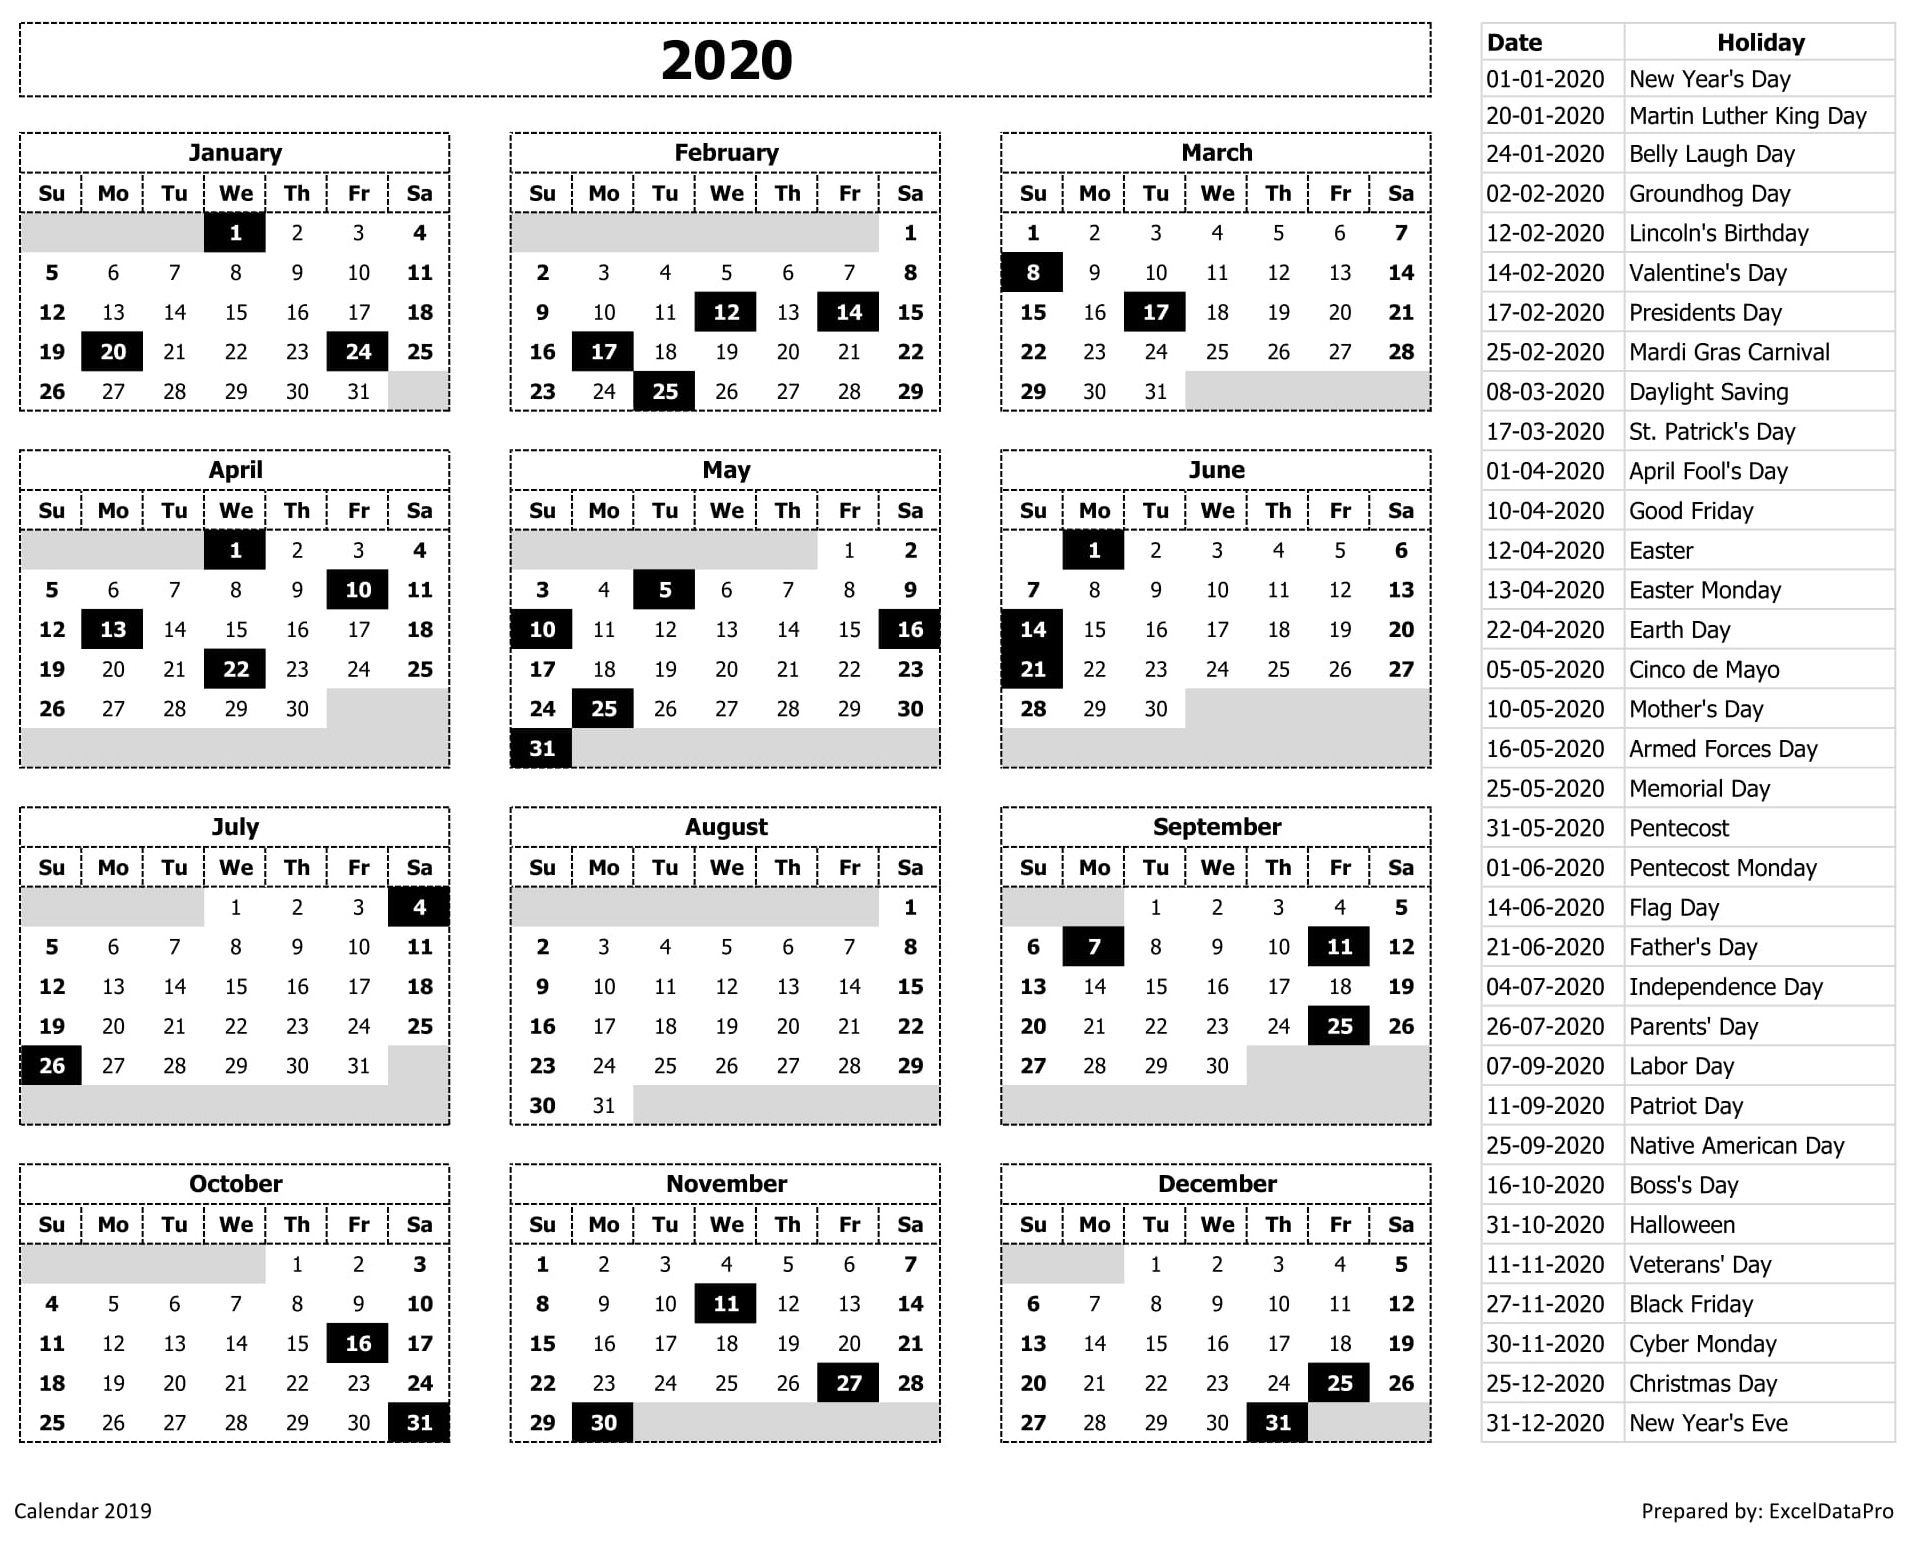 2020 Calendar Excel Templates, Printable Pdfs & Images - Exceldatapro 2020 Calendar Holiday List